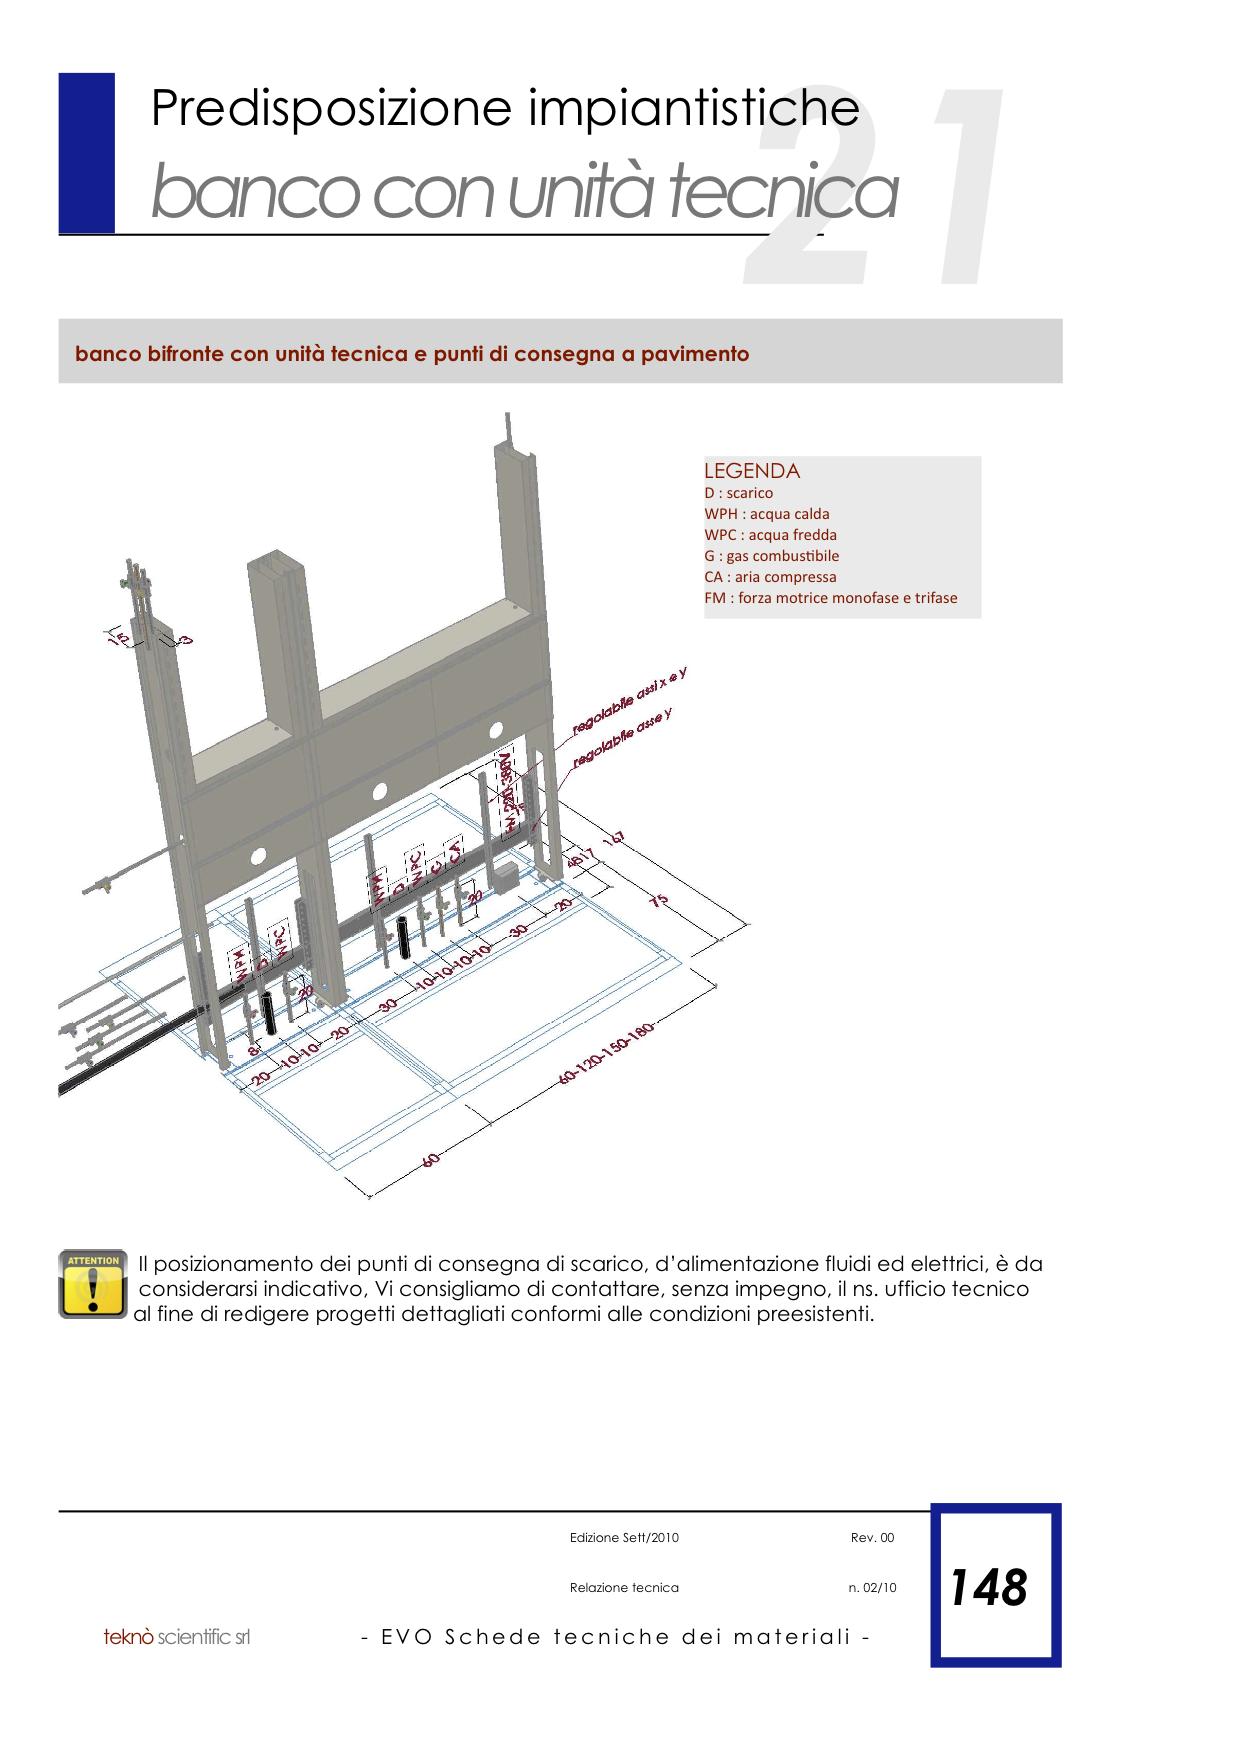 EVO Schede Tecniche materiali copia 8.png